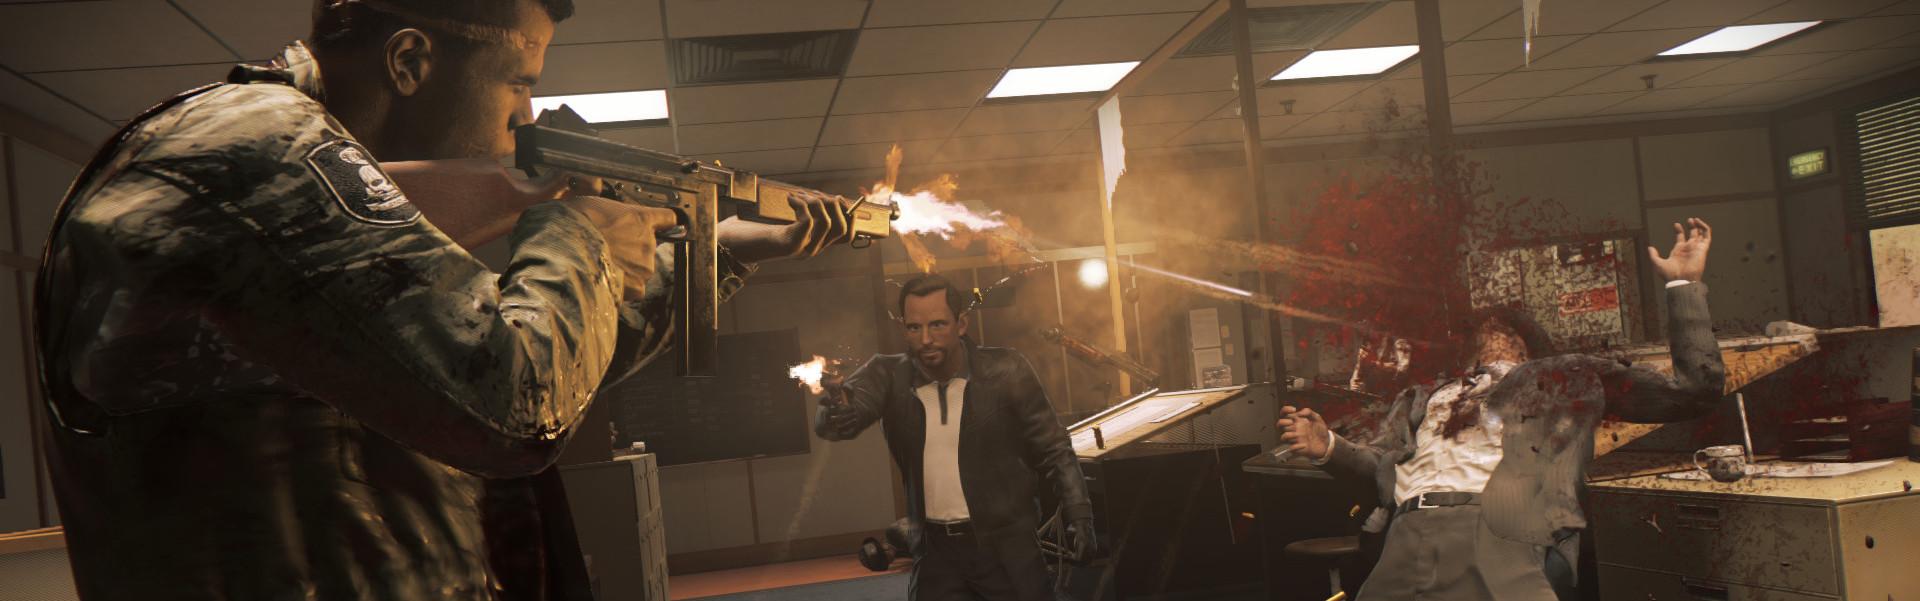 Mafia III Digital Deluxe Edition Steam Key GLOBAL